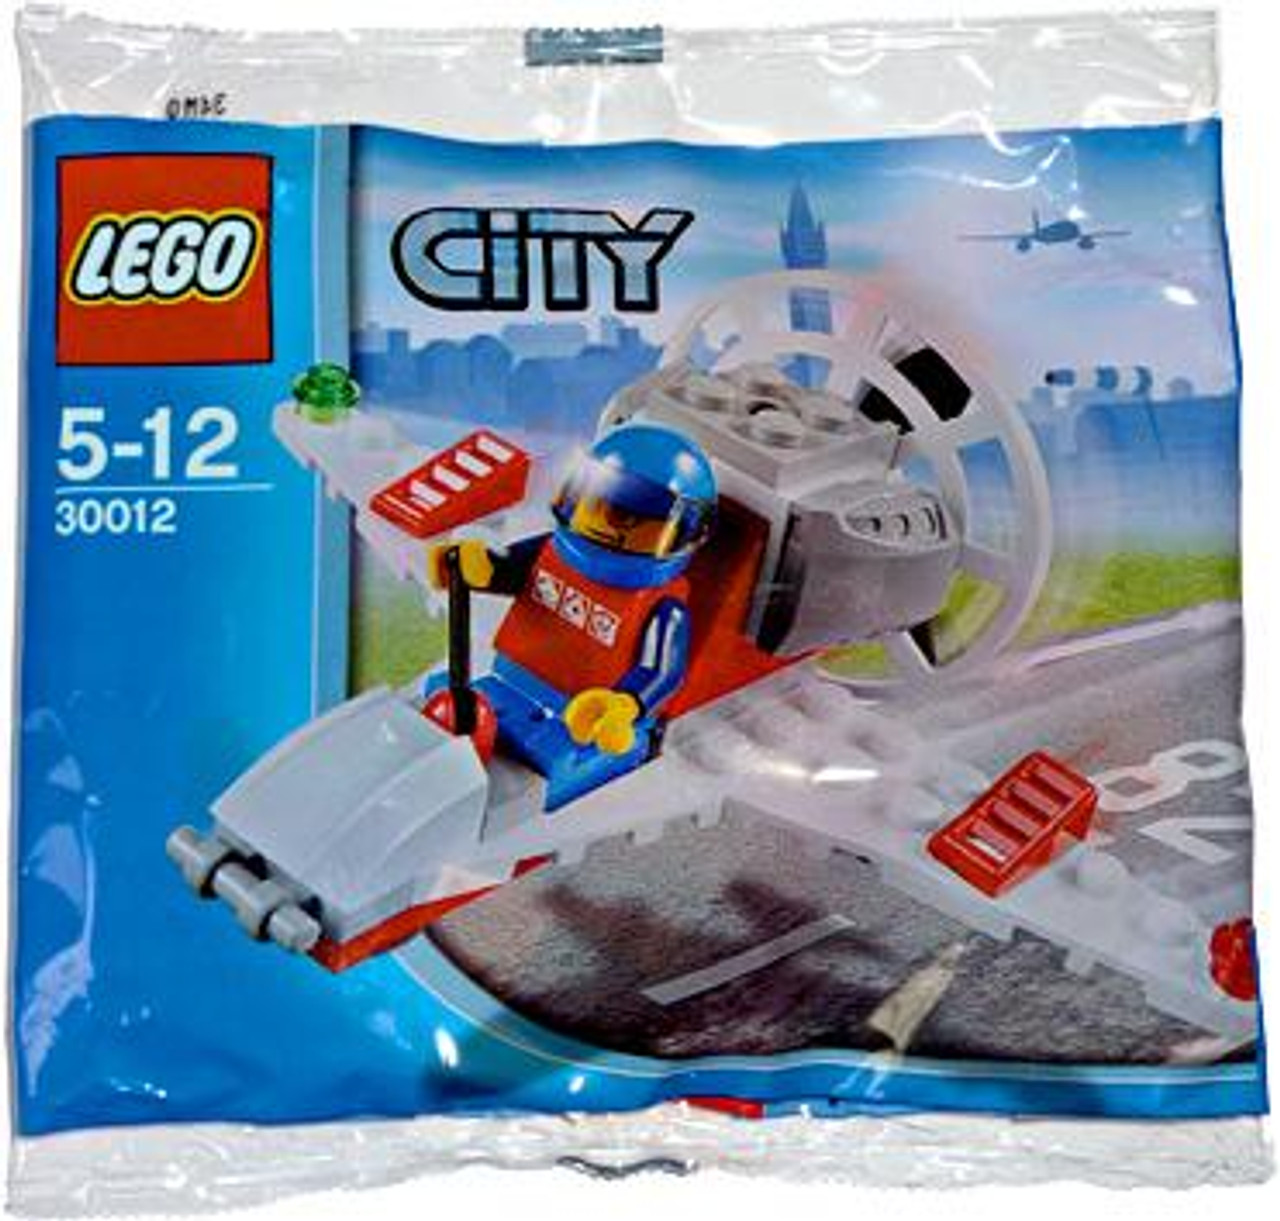 LEGO City Mini Airplane Mini Set #30012 [Bagged]